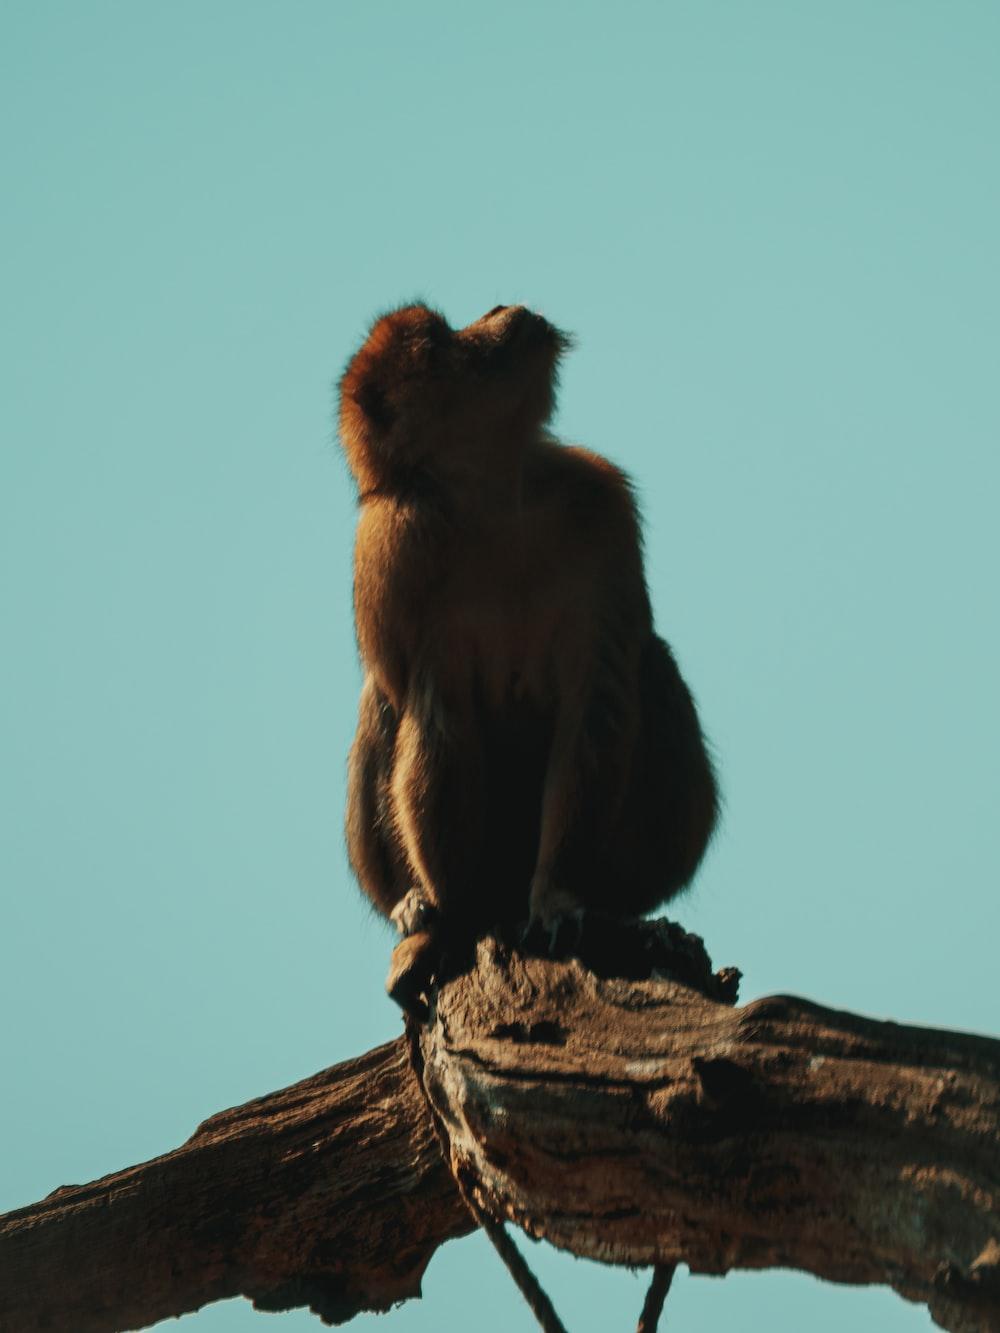 brown monkey sitting on brown wood log under blue sky during daytime